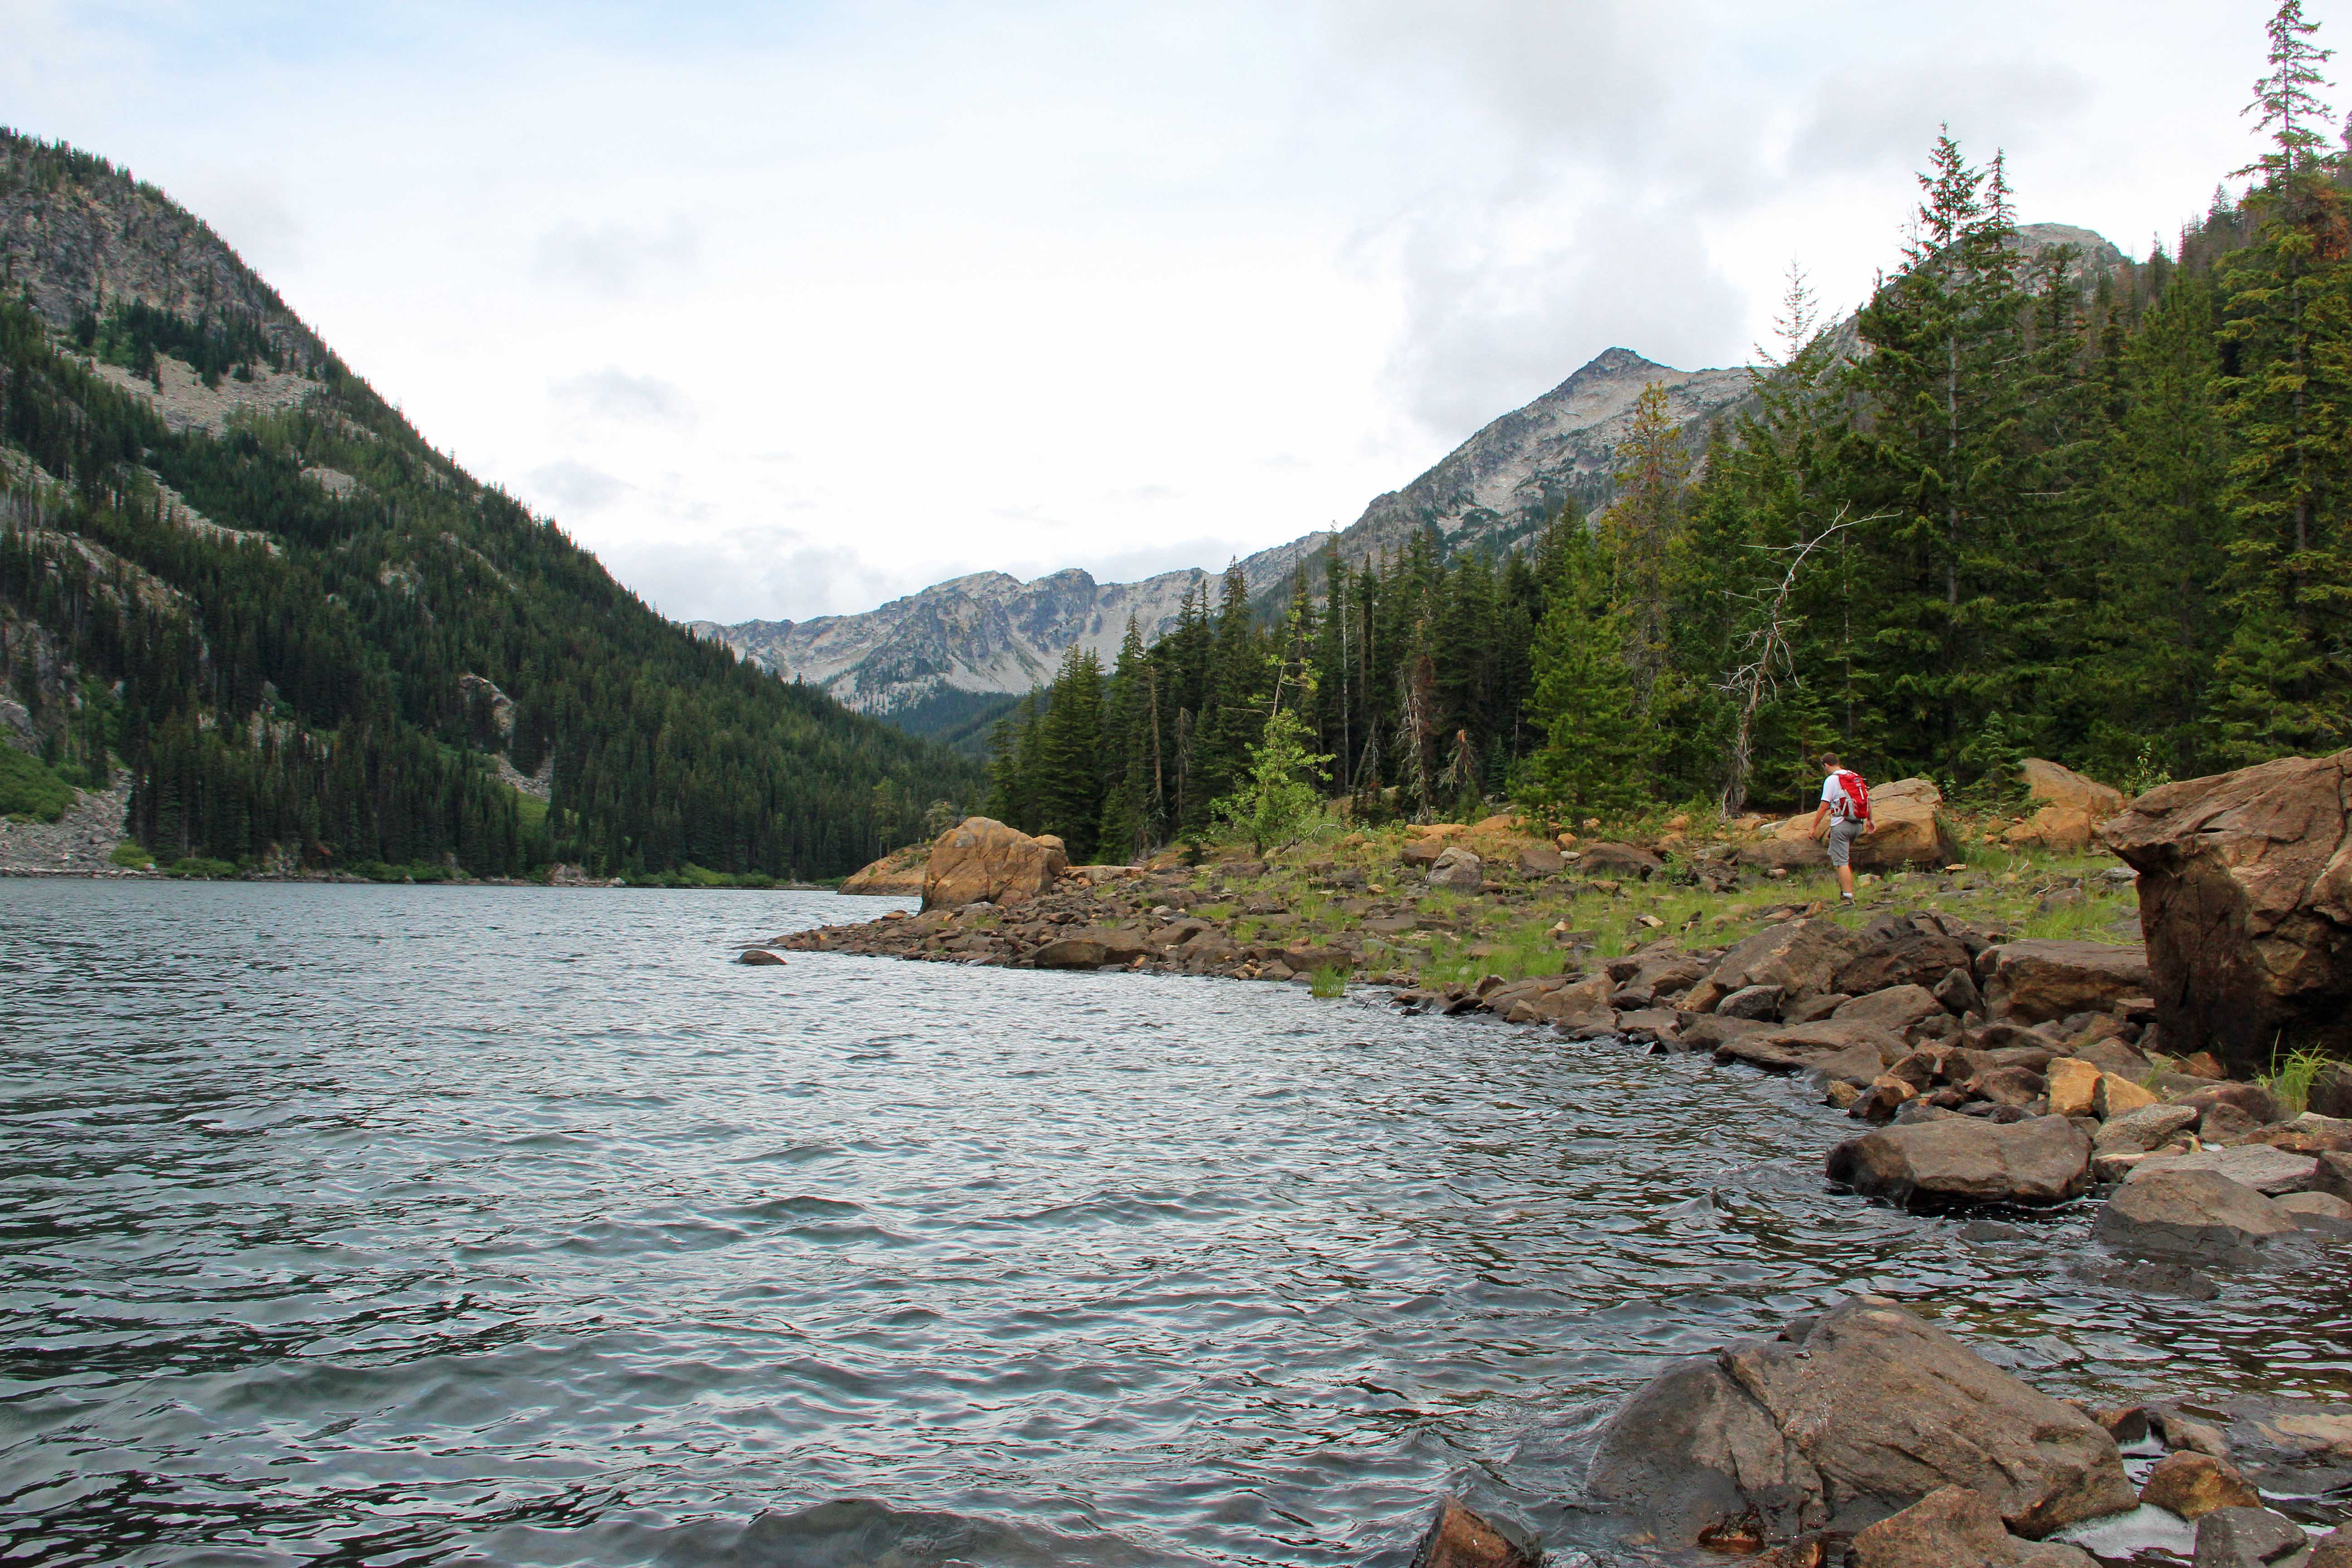 Day Hike: Eightmile Lake